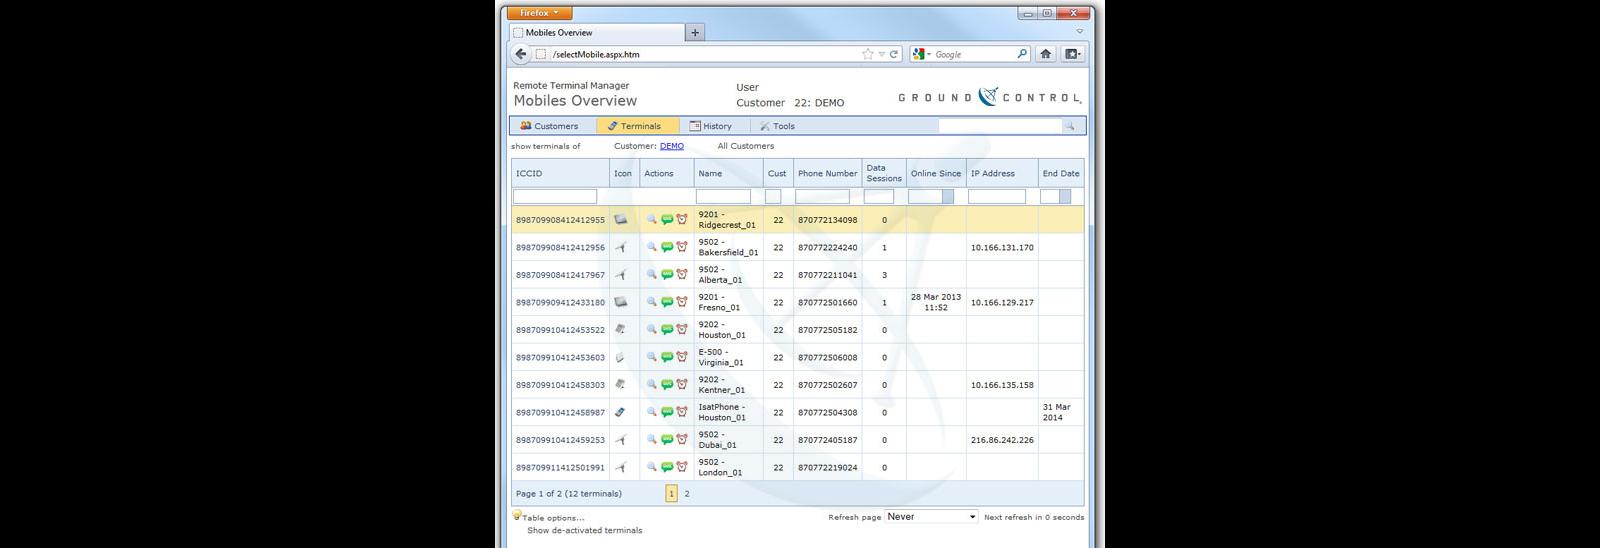 BGAN_Management_Web_Interface_01